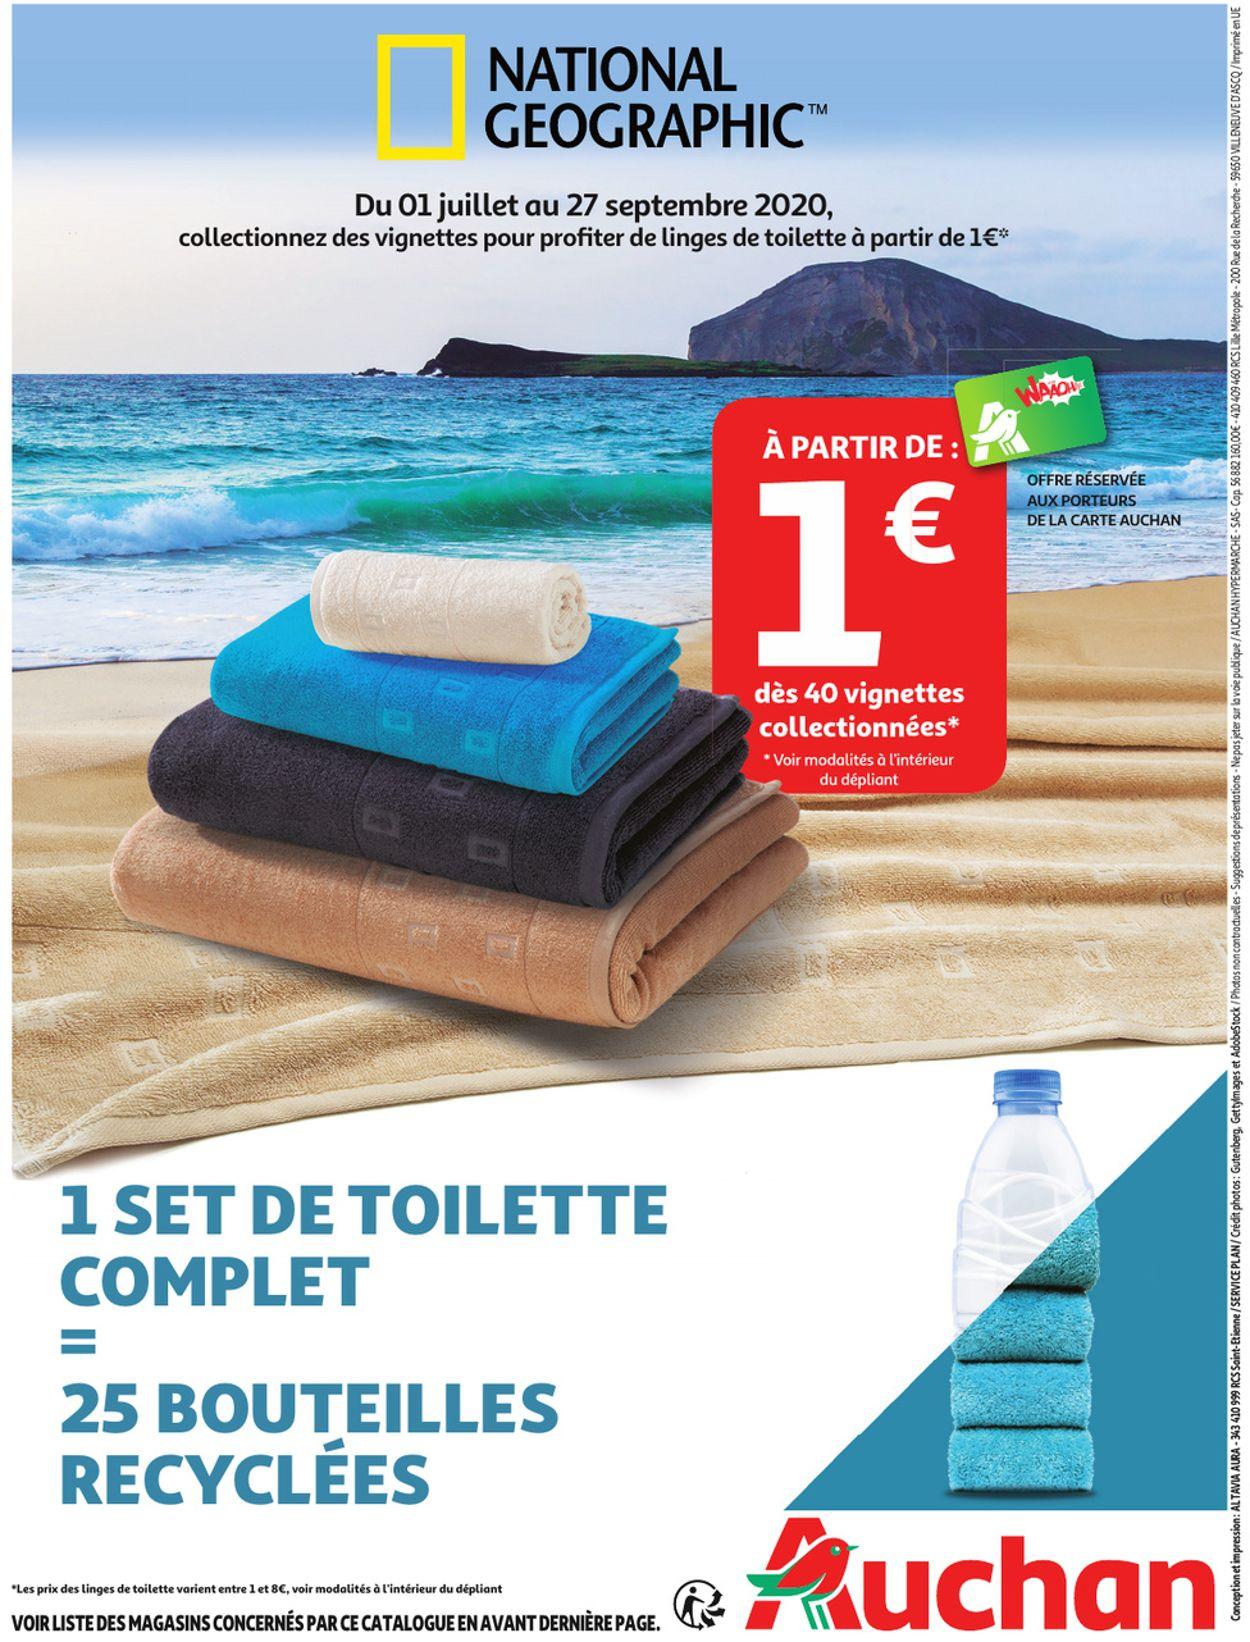 Auchan Catalogue - 01.07-07.07.2020 (Page 36)